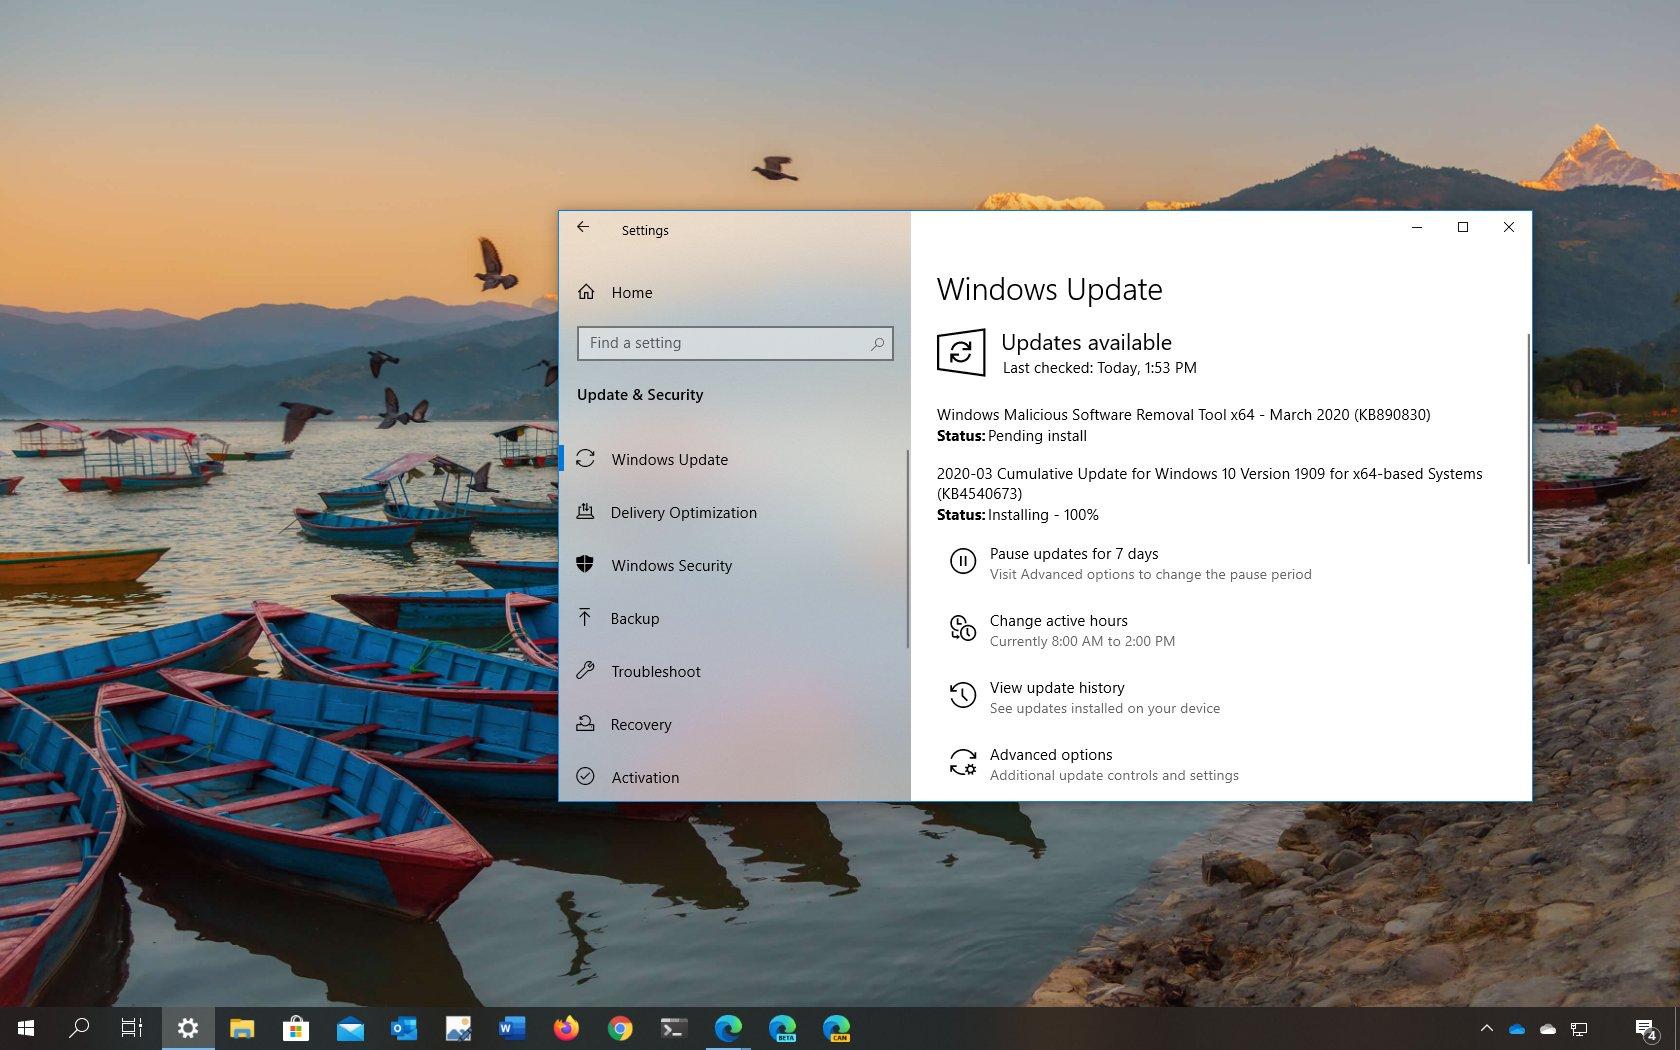 Windows 10 KB4540673 download